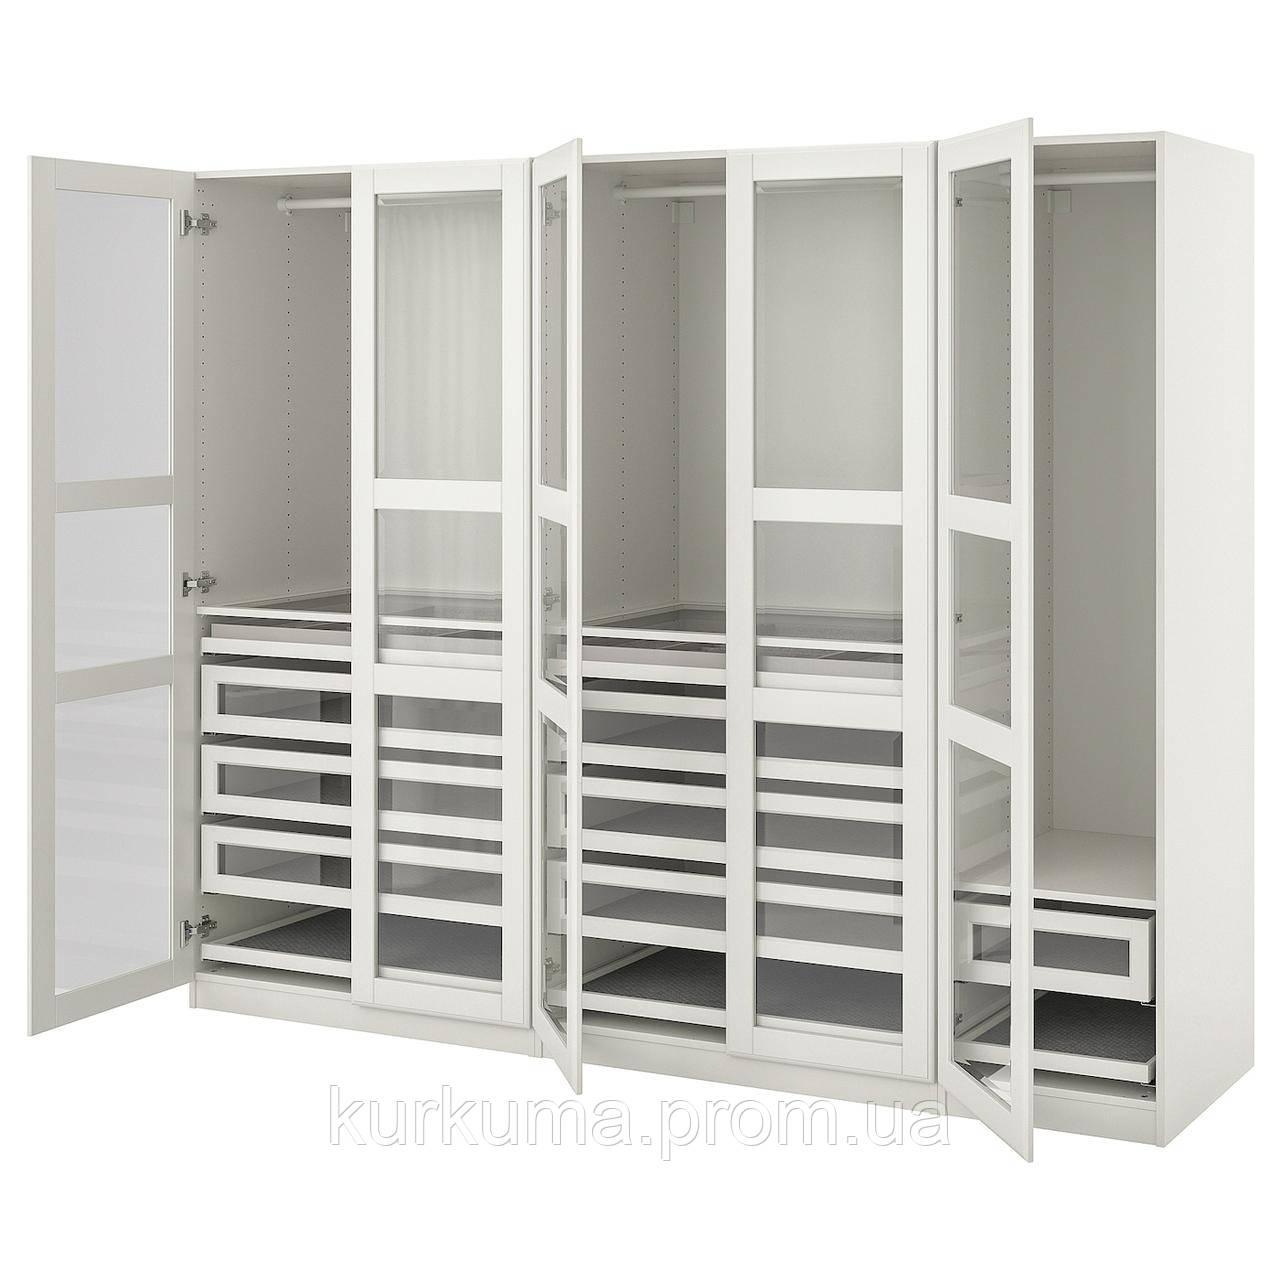 IKEA PAX / TYSSEDAL Шкаф, белое, белое стекло, 250x60x201 см (893.249.49)